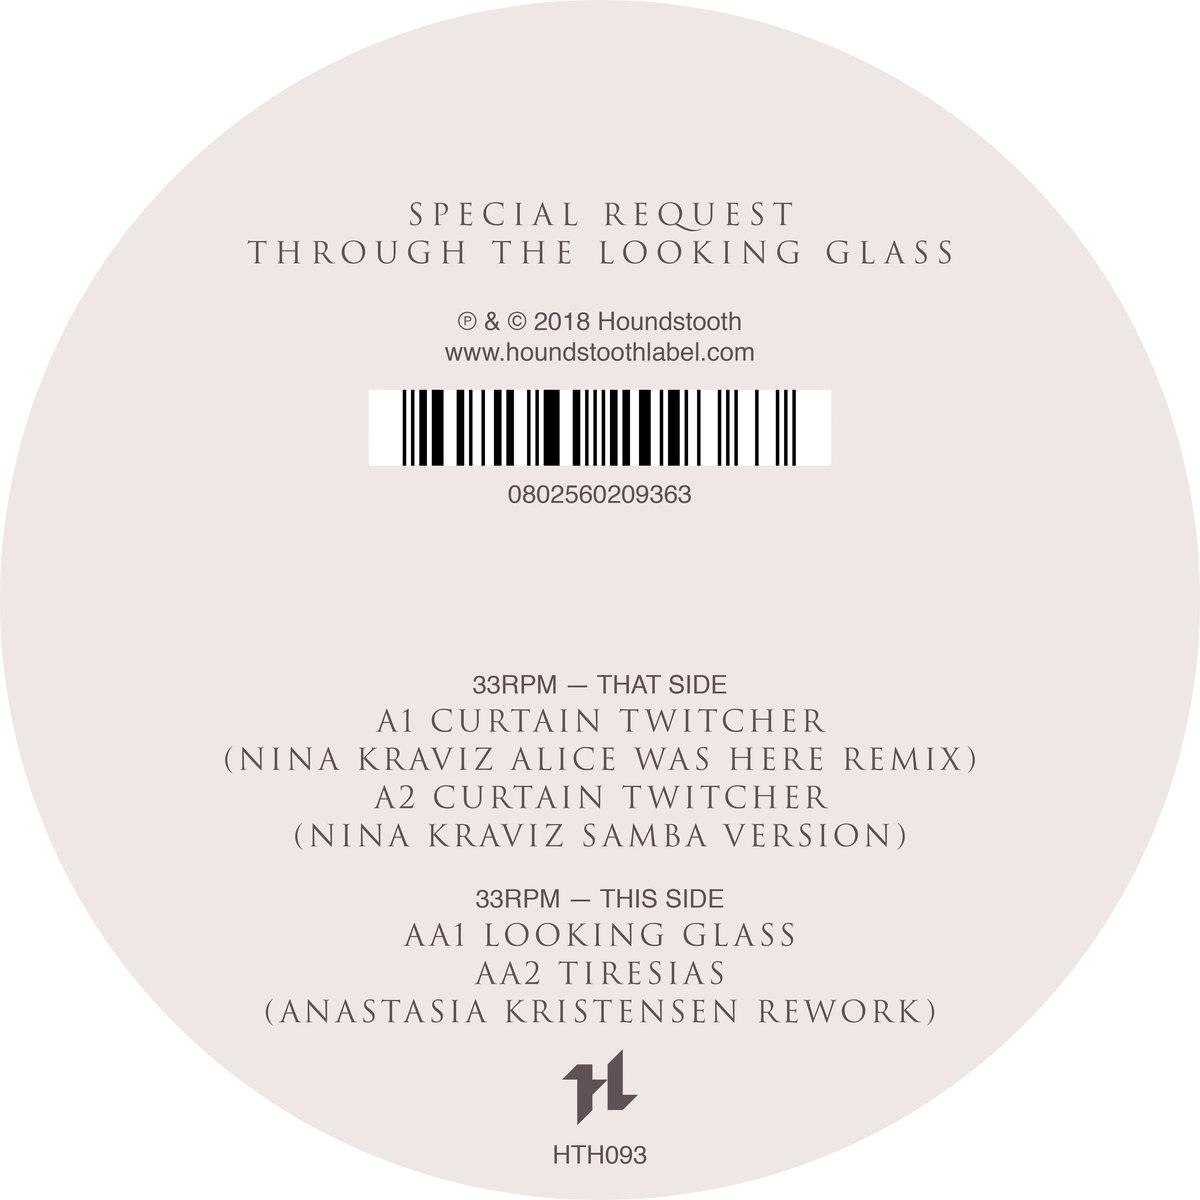 Nina Kraviz & Anastasia Kristensen Have Remixed Special